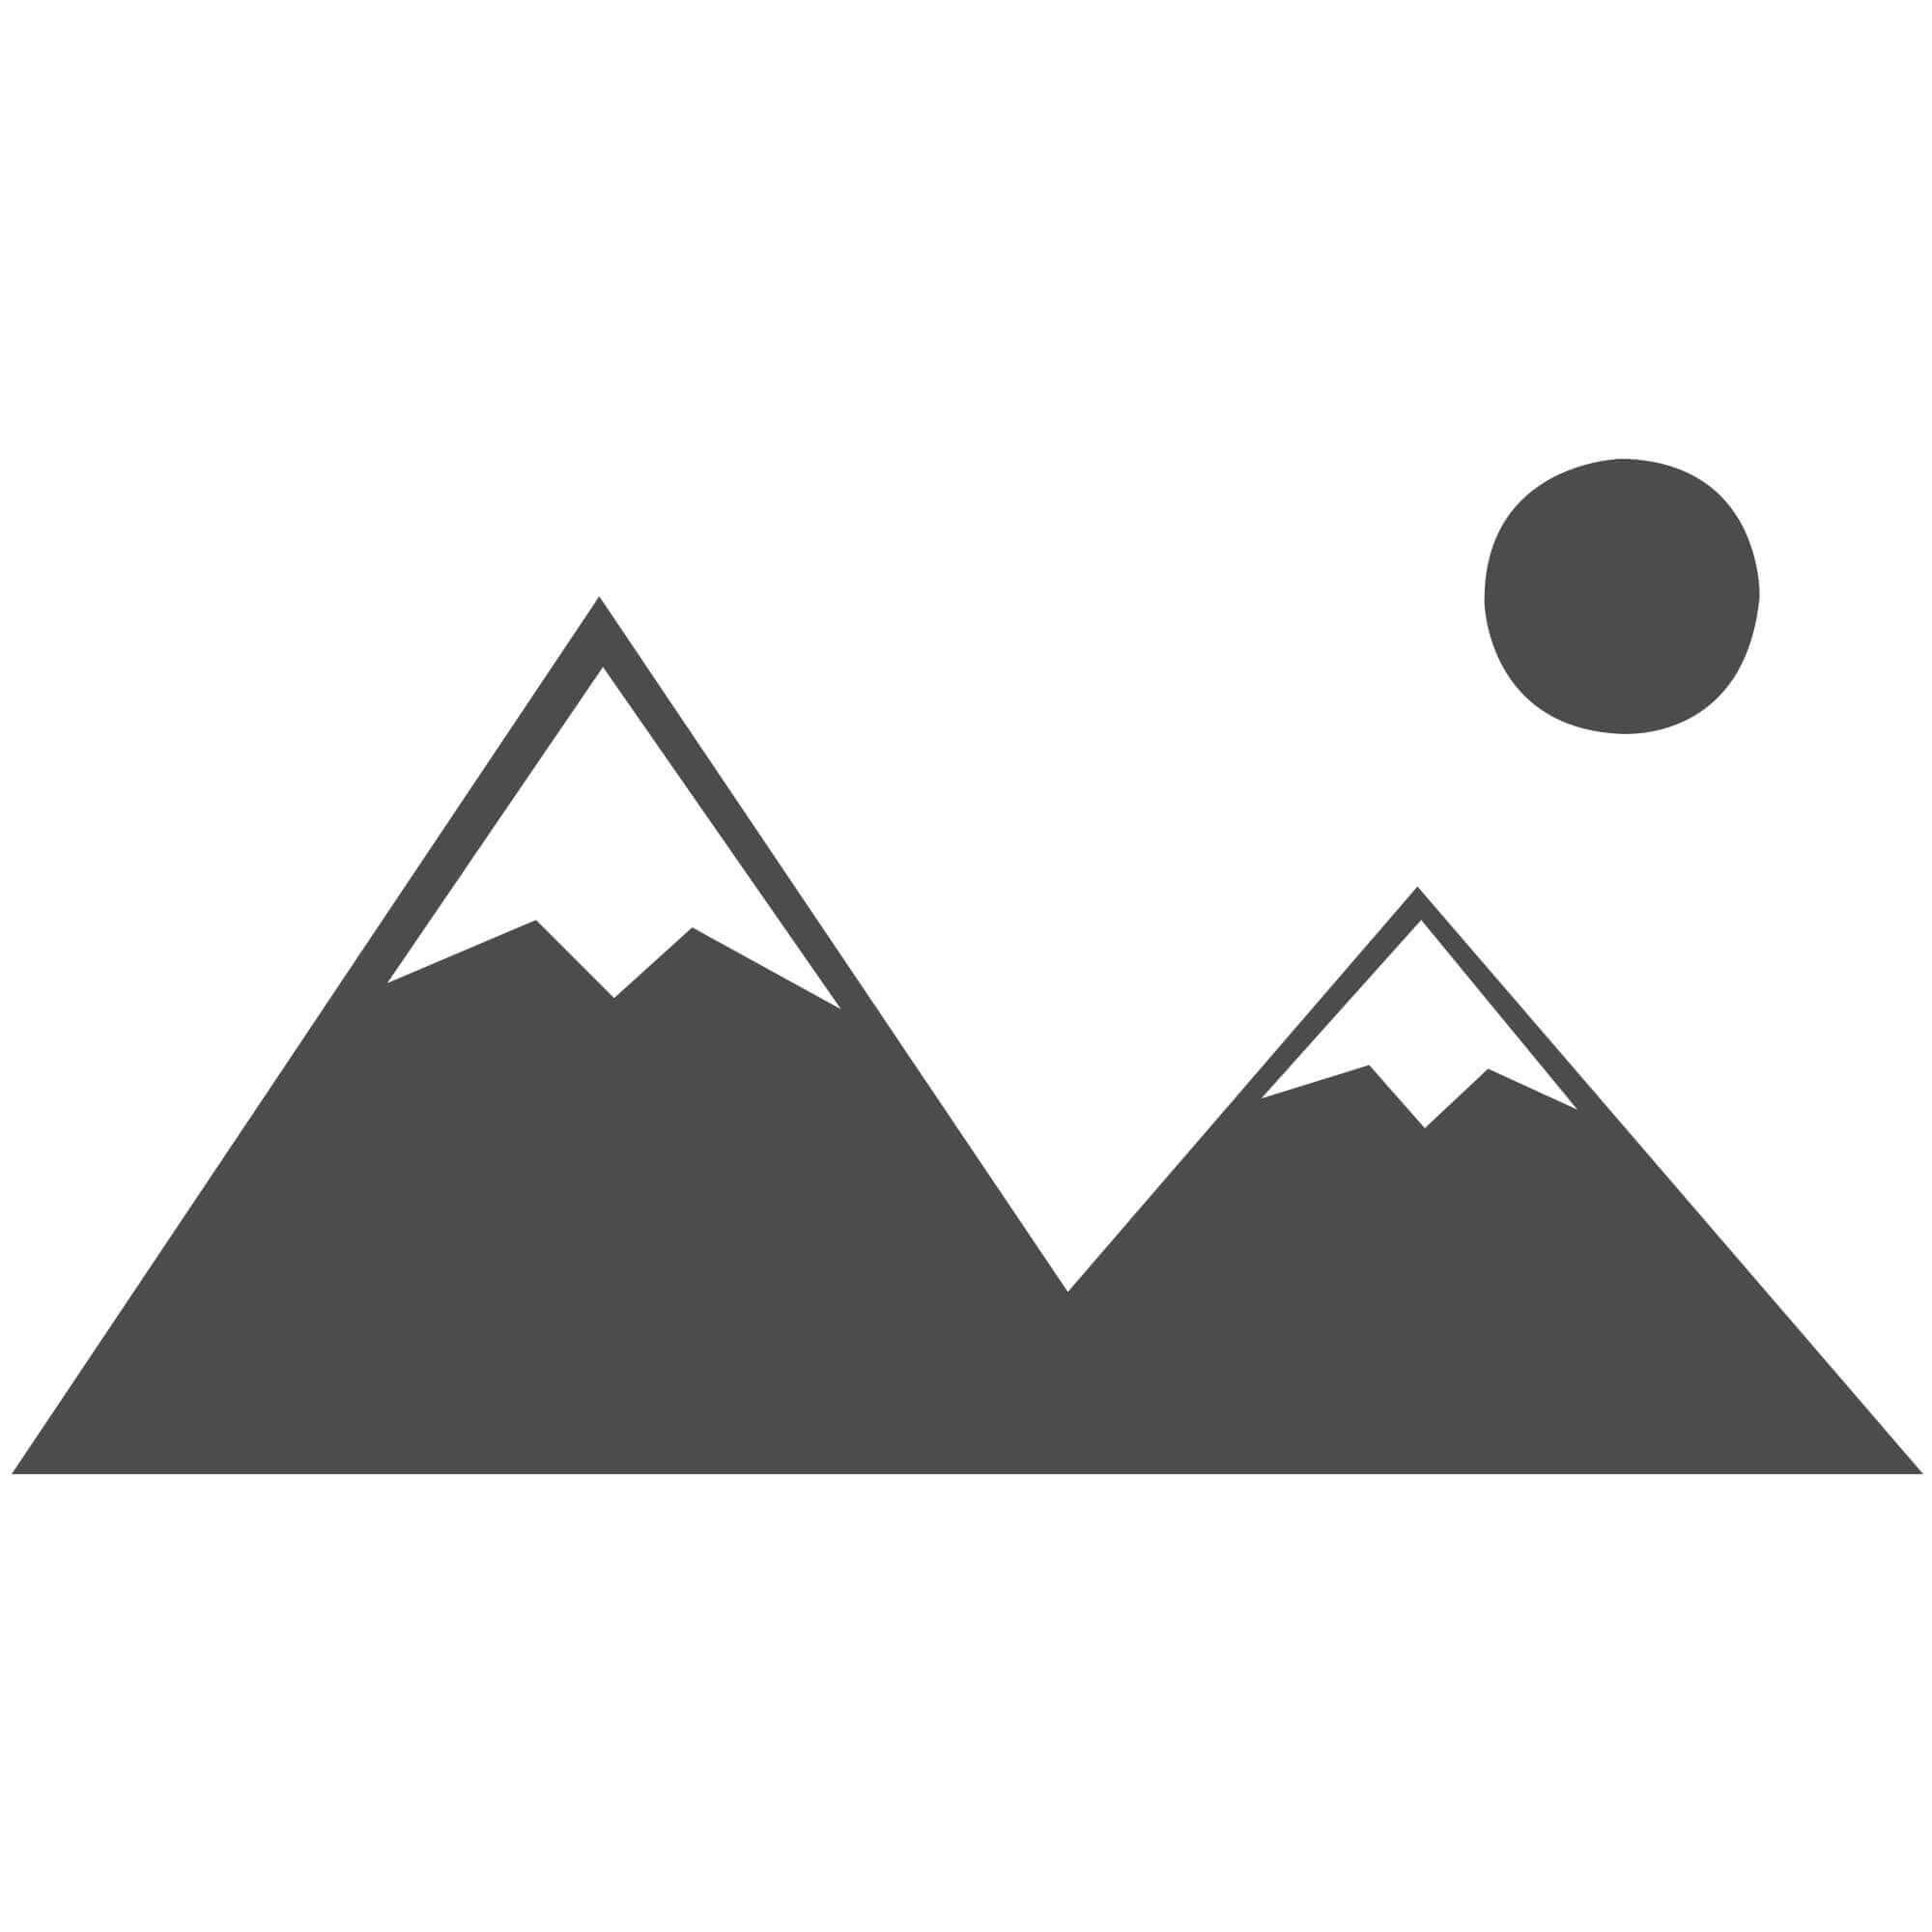 New Vintage Yellow 8084 Rug by Louis de Poortere-60 x 90 cm (2' x 3')